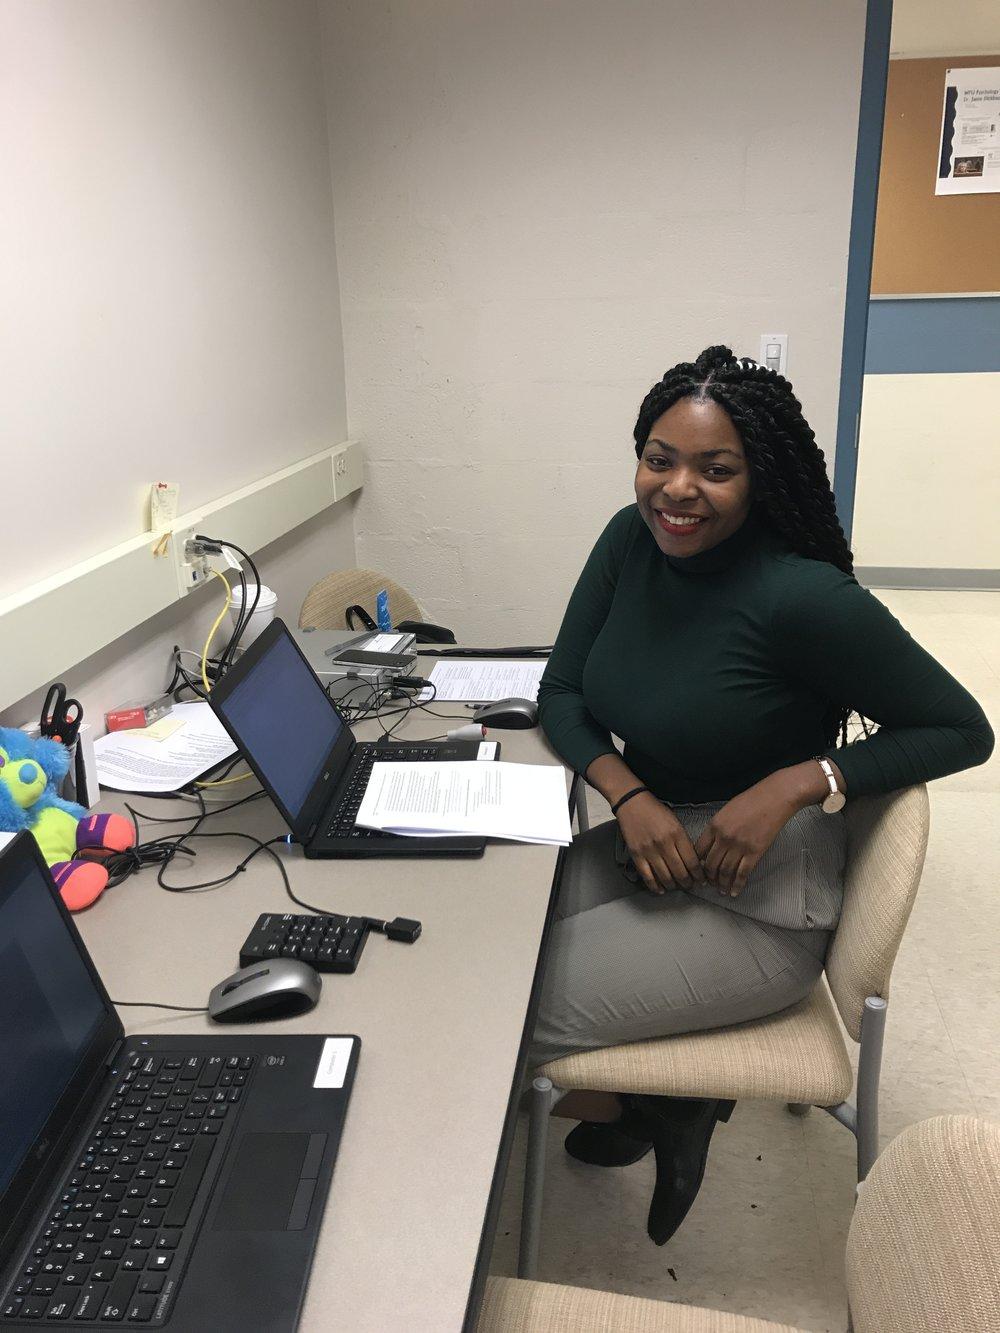 Jojo working in the lab.